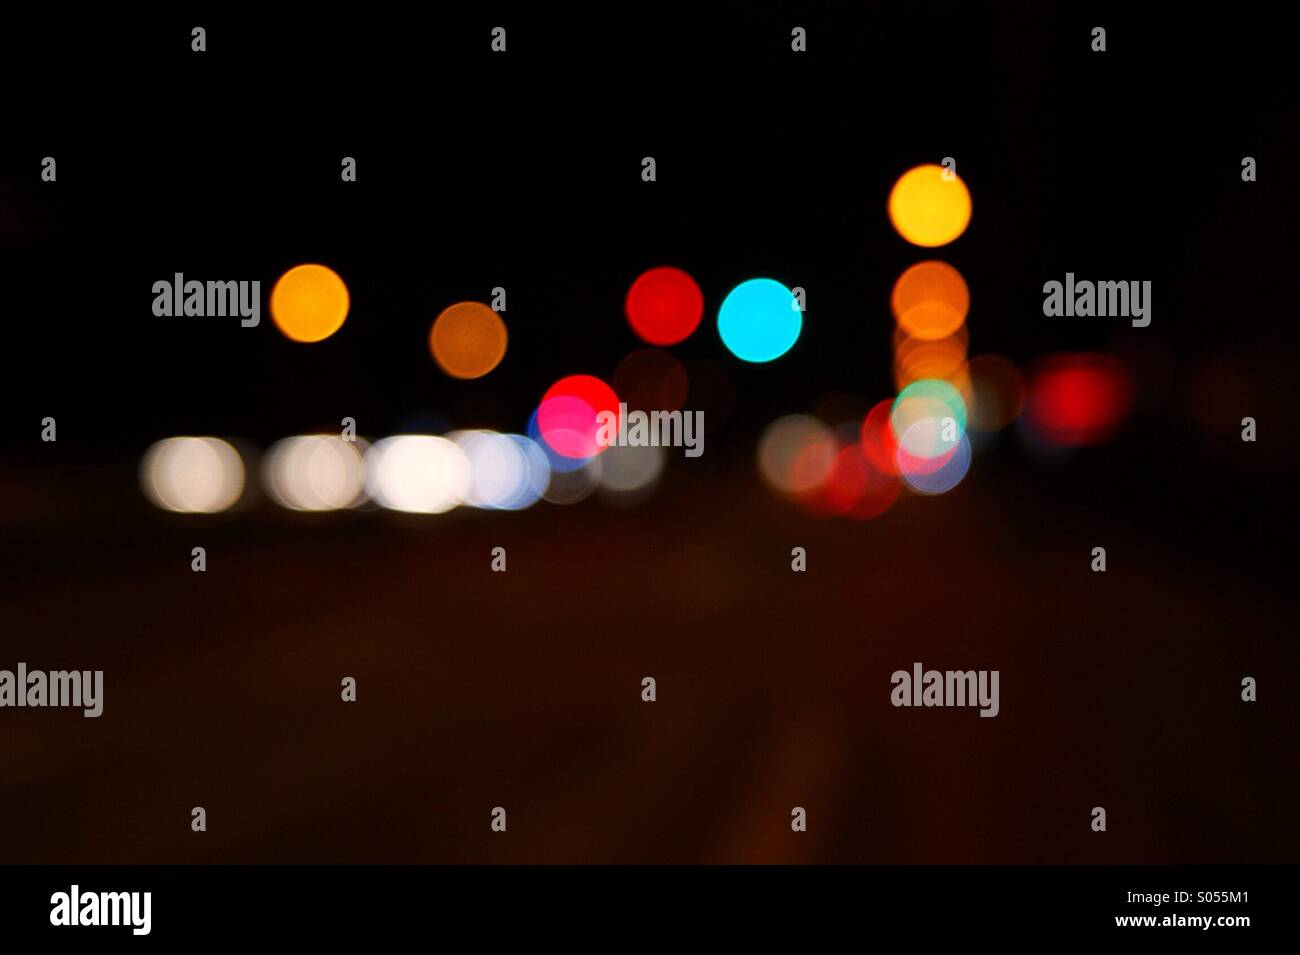 light art light dots - Stock Image